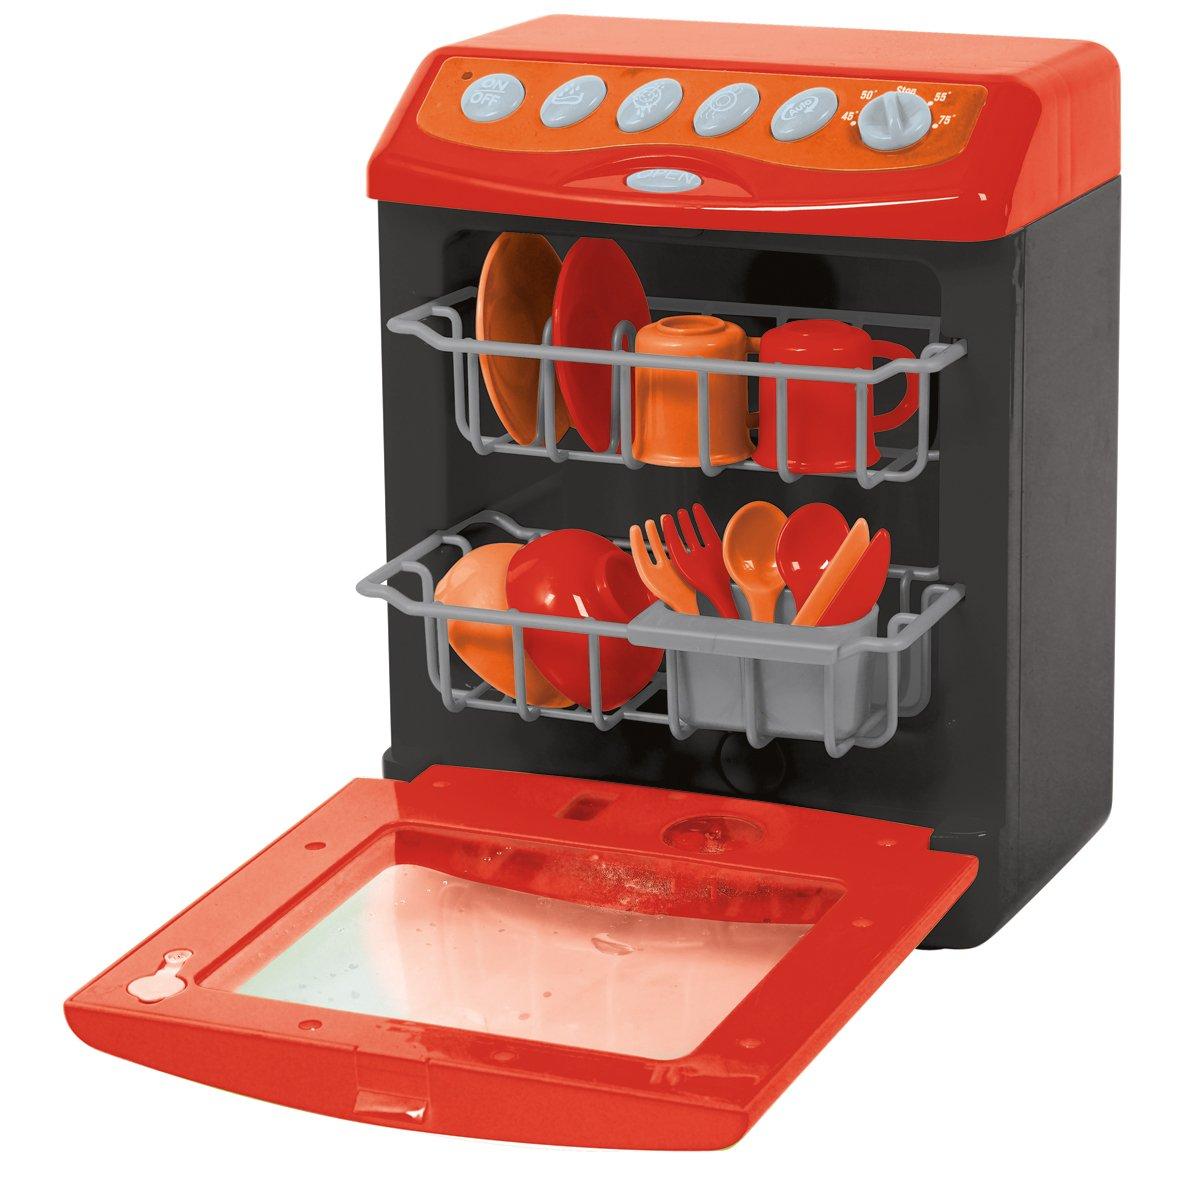 Kinder Spülmaschine - Spielzeug Spülmaschine - PlayGo Geschirrspüler